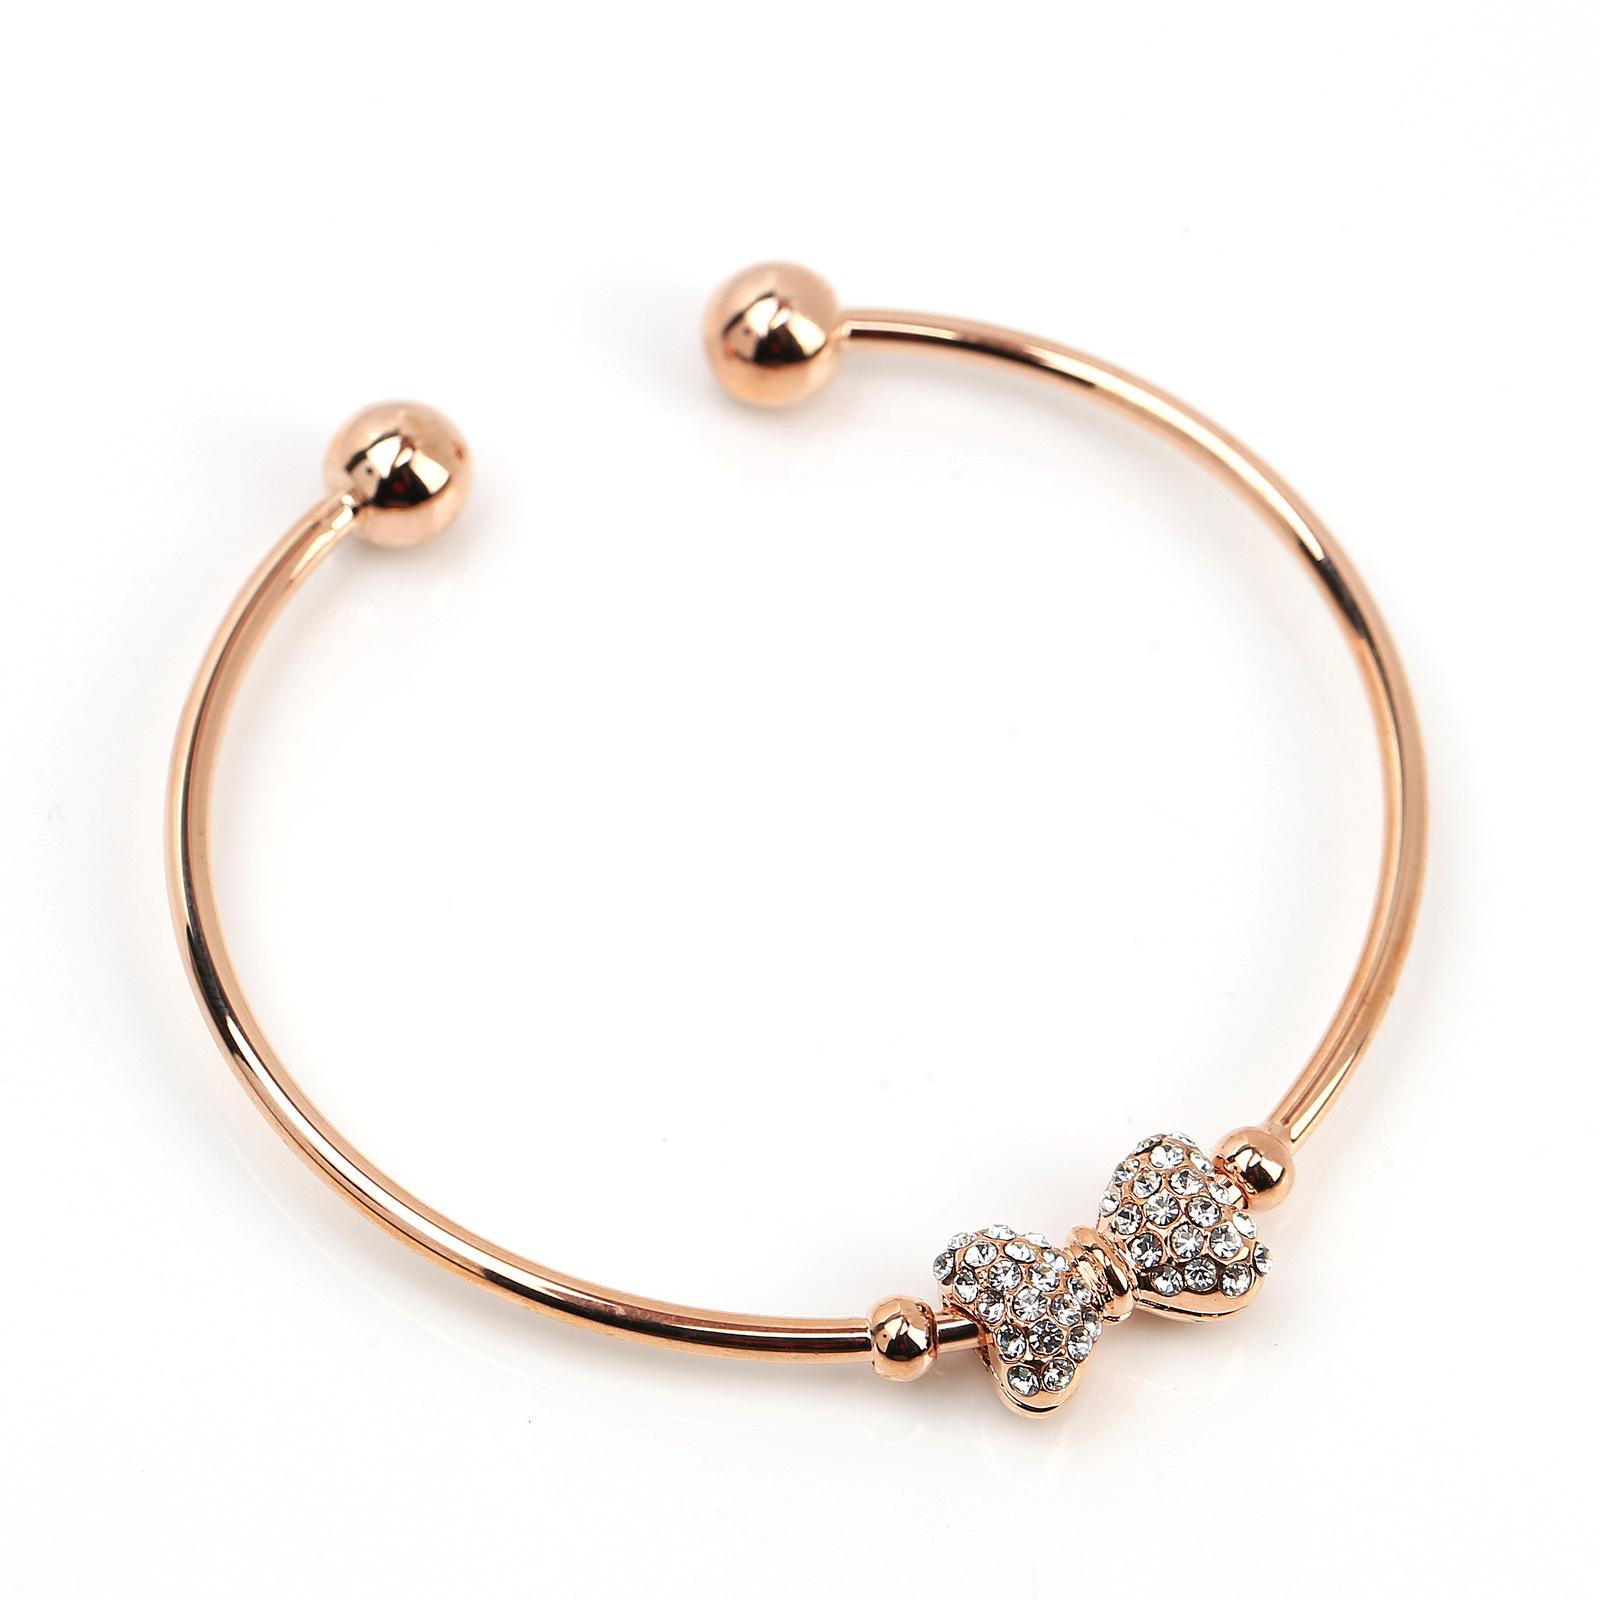 UE- Trendy Rose Tone Designer Bangle Bracelet With Swarovski Style Crystal Bow